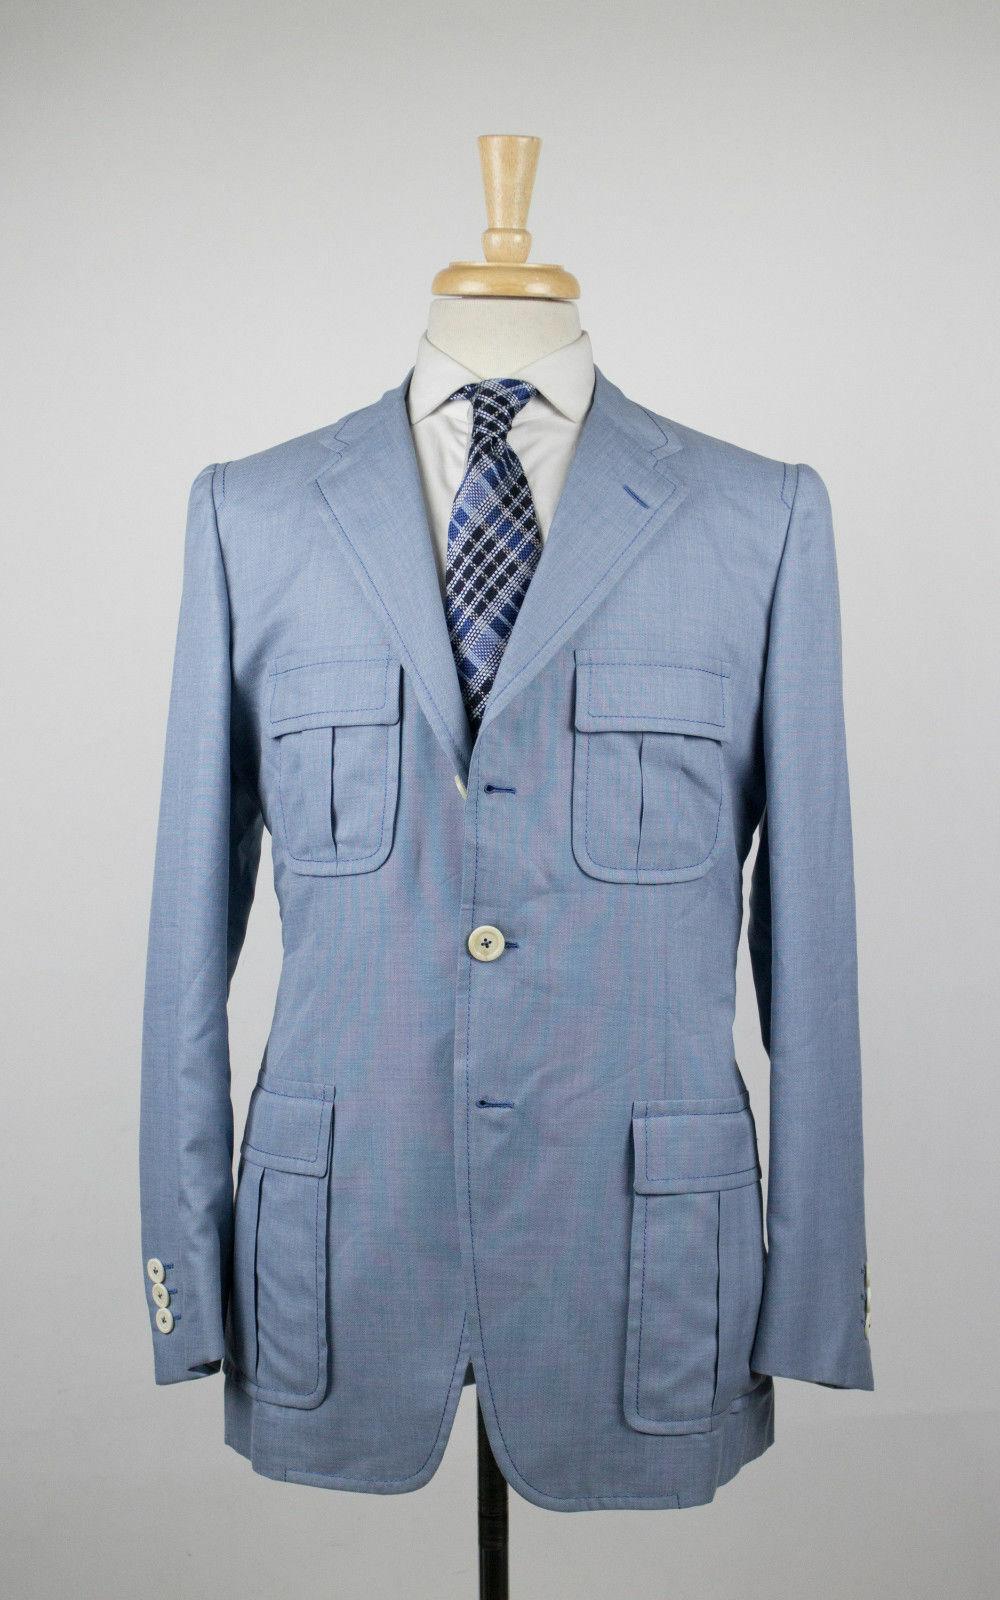 New D'AVENZA Blau wolleBlend 3 Button Sport Coat Blazer 50 40 R  2995